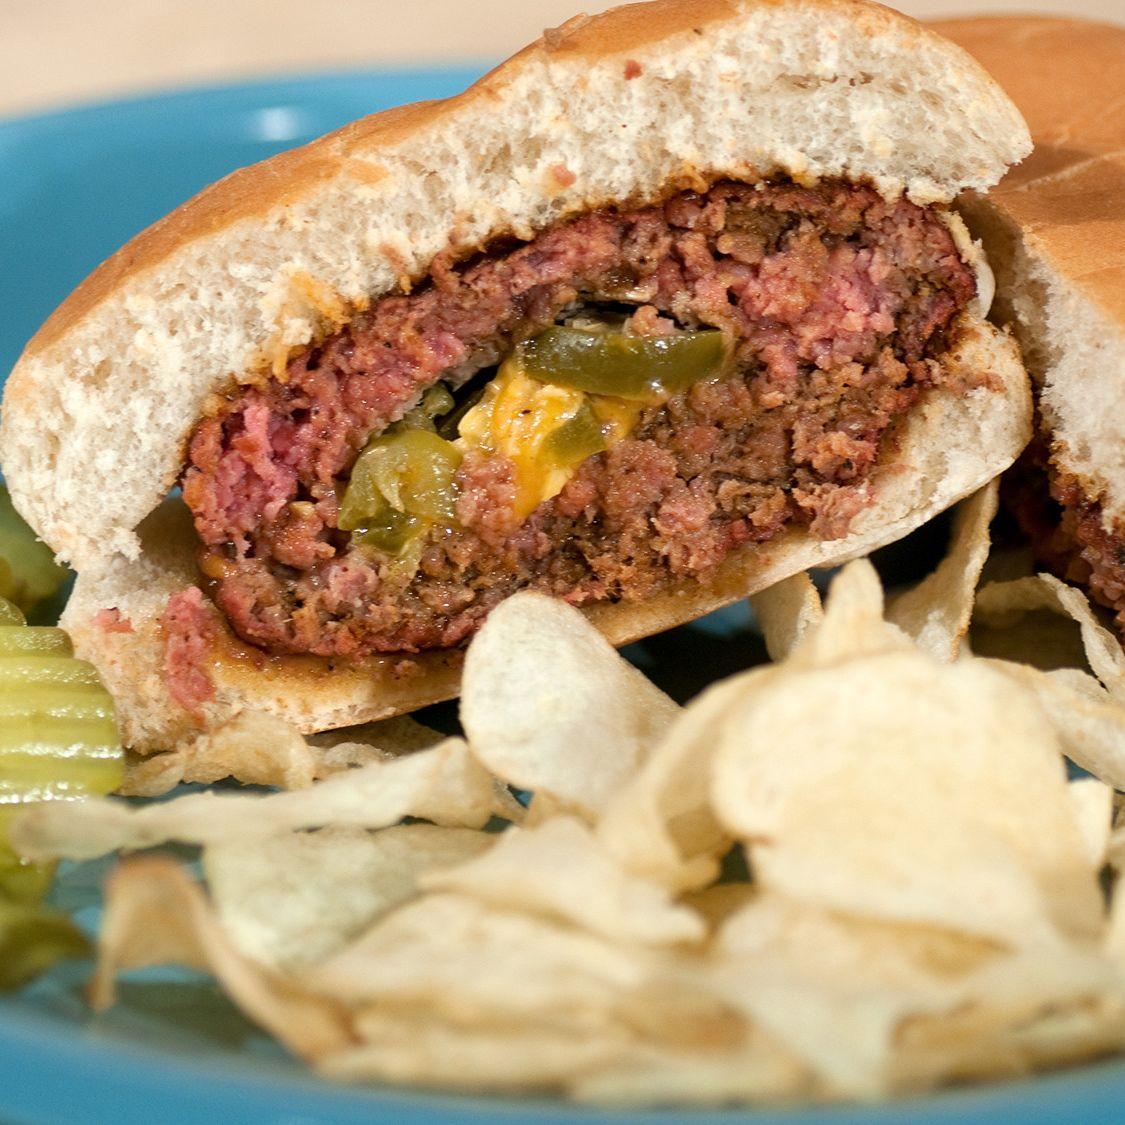 stubbs_stuffed_burger.jpg